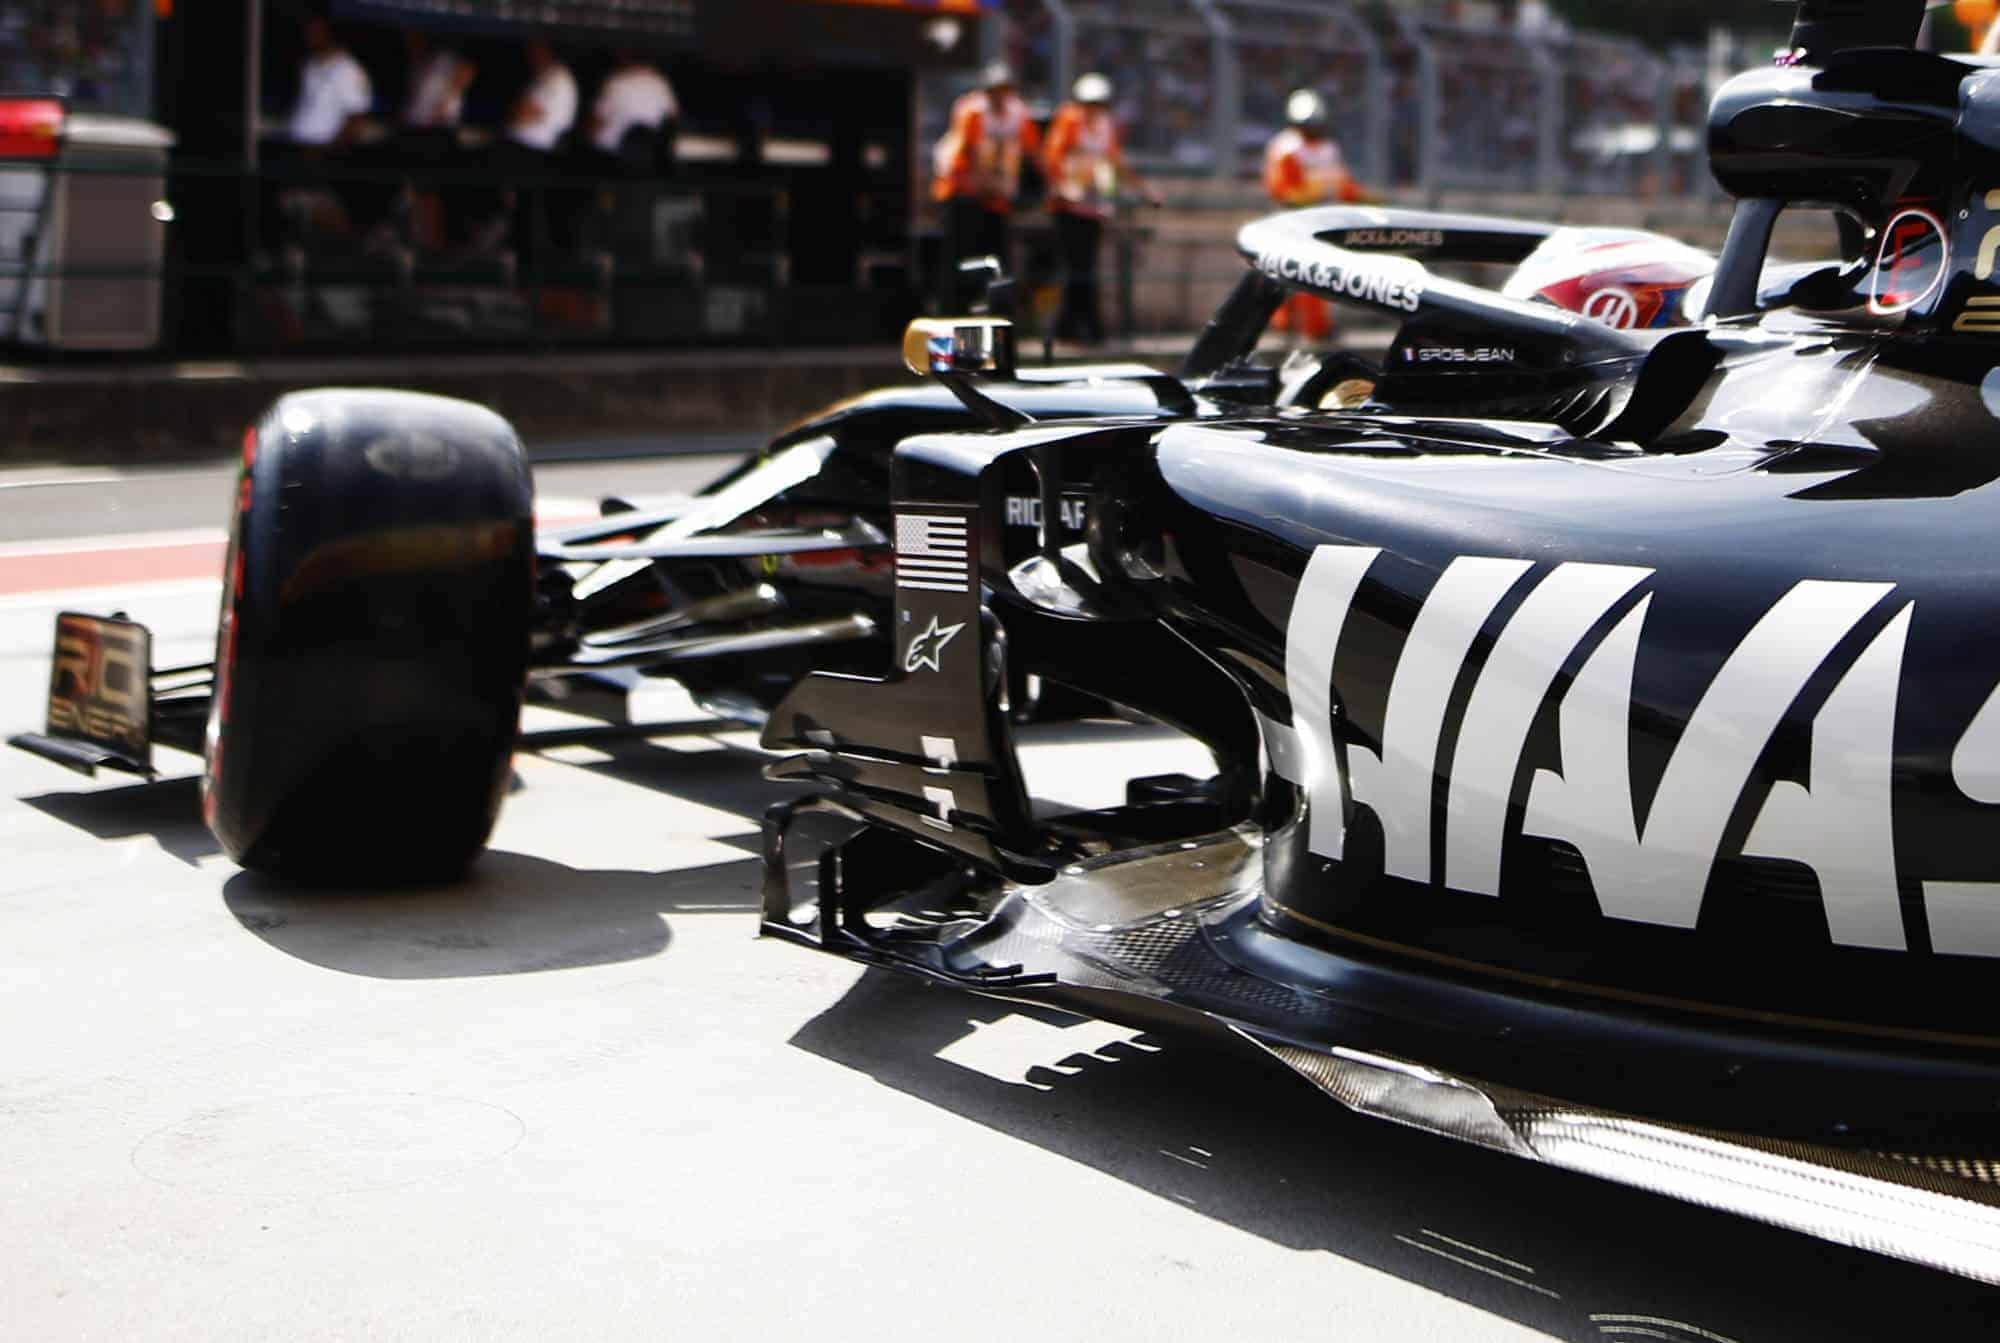 Romain Grosjean Haas VF-19 Hungarian GP F1 2019 old aero package Melbourne Photo Haas